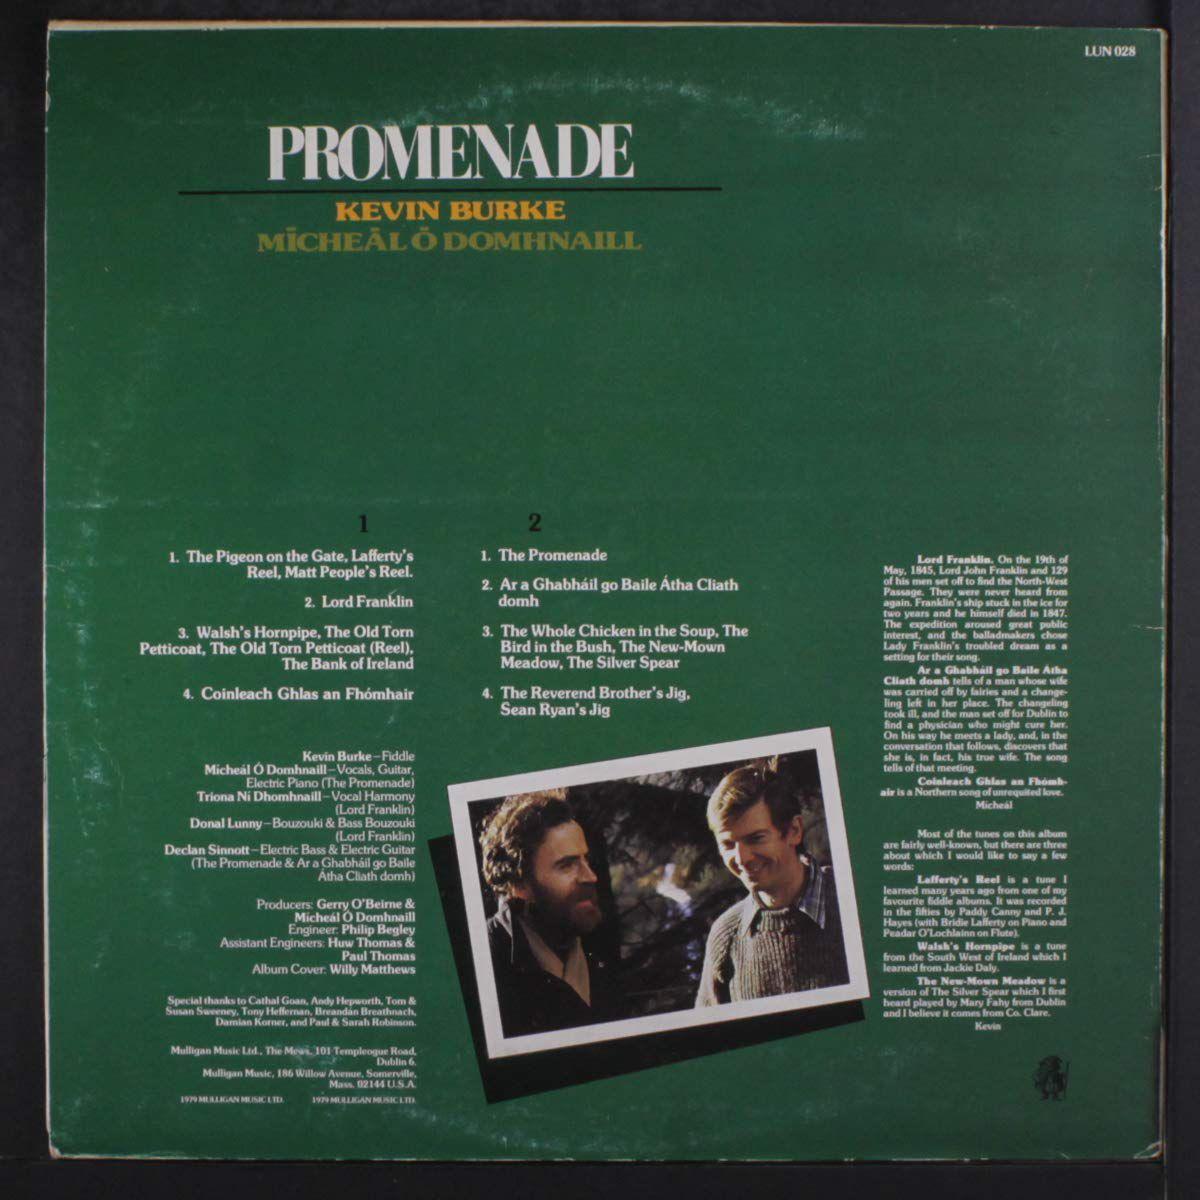 Les albums de ma jeunesse (20) Kevin Burke & Micheal O' Domhnaill : Promenade